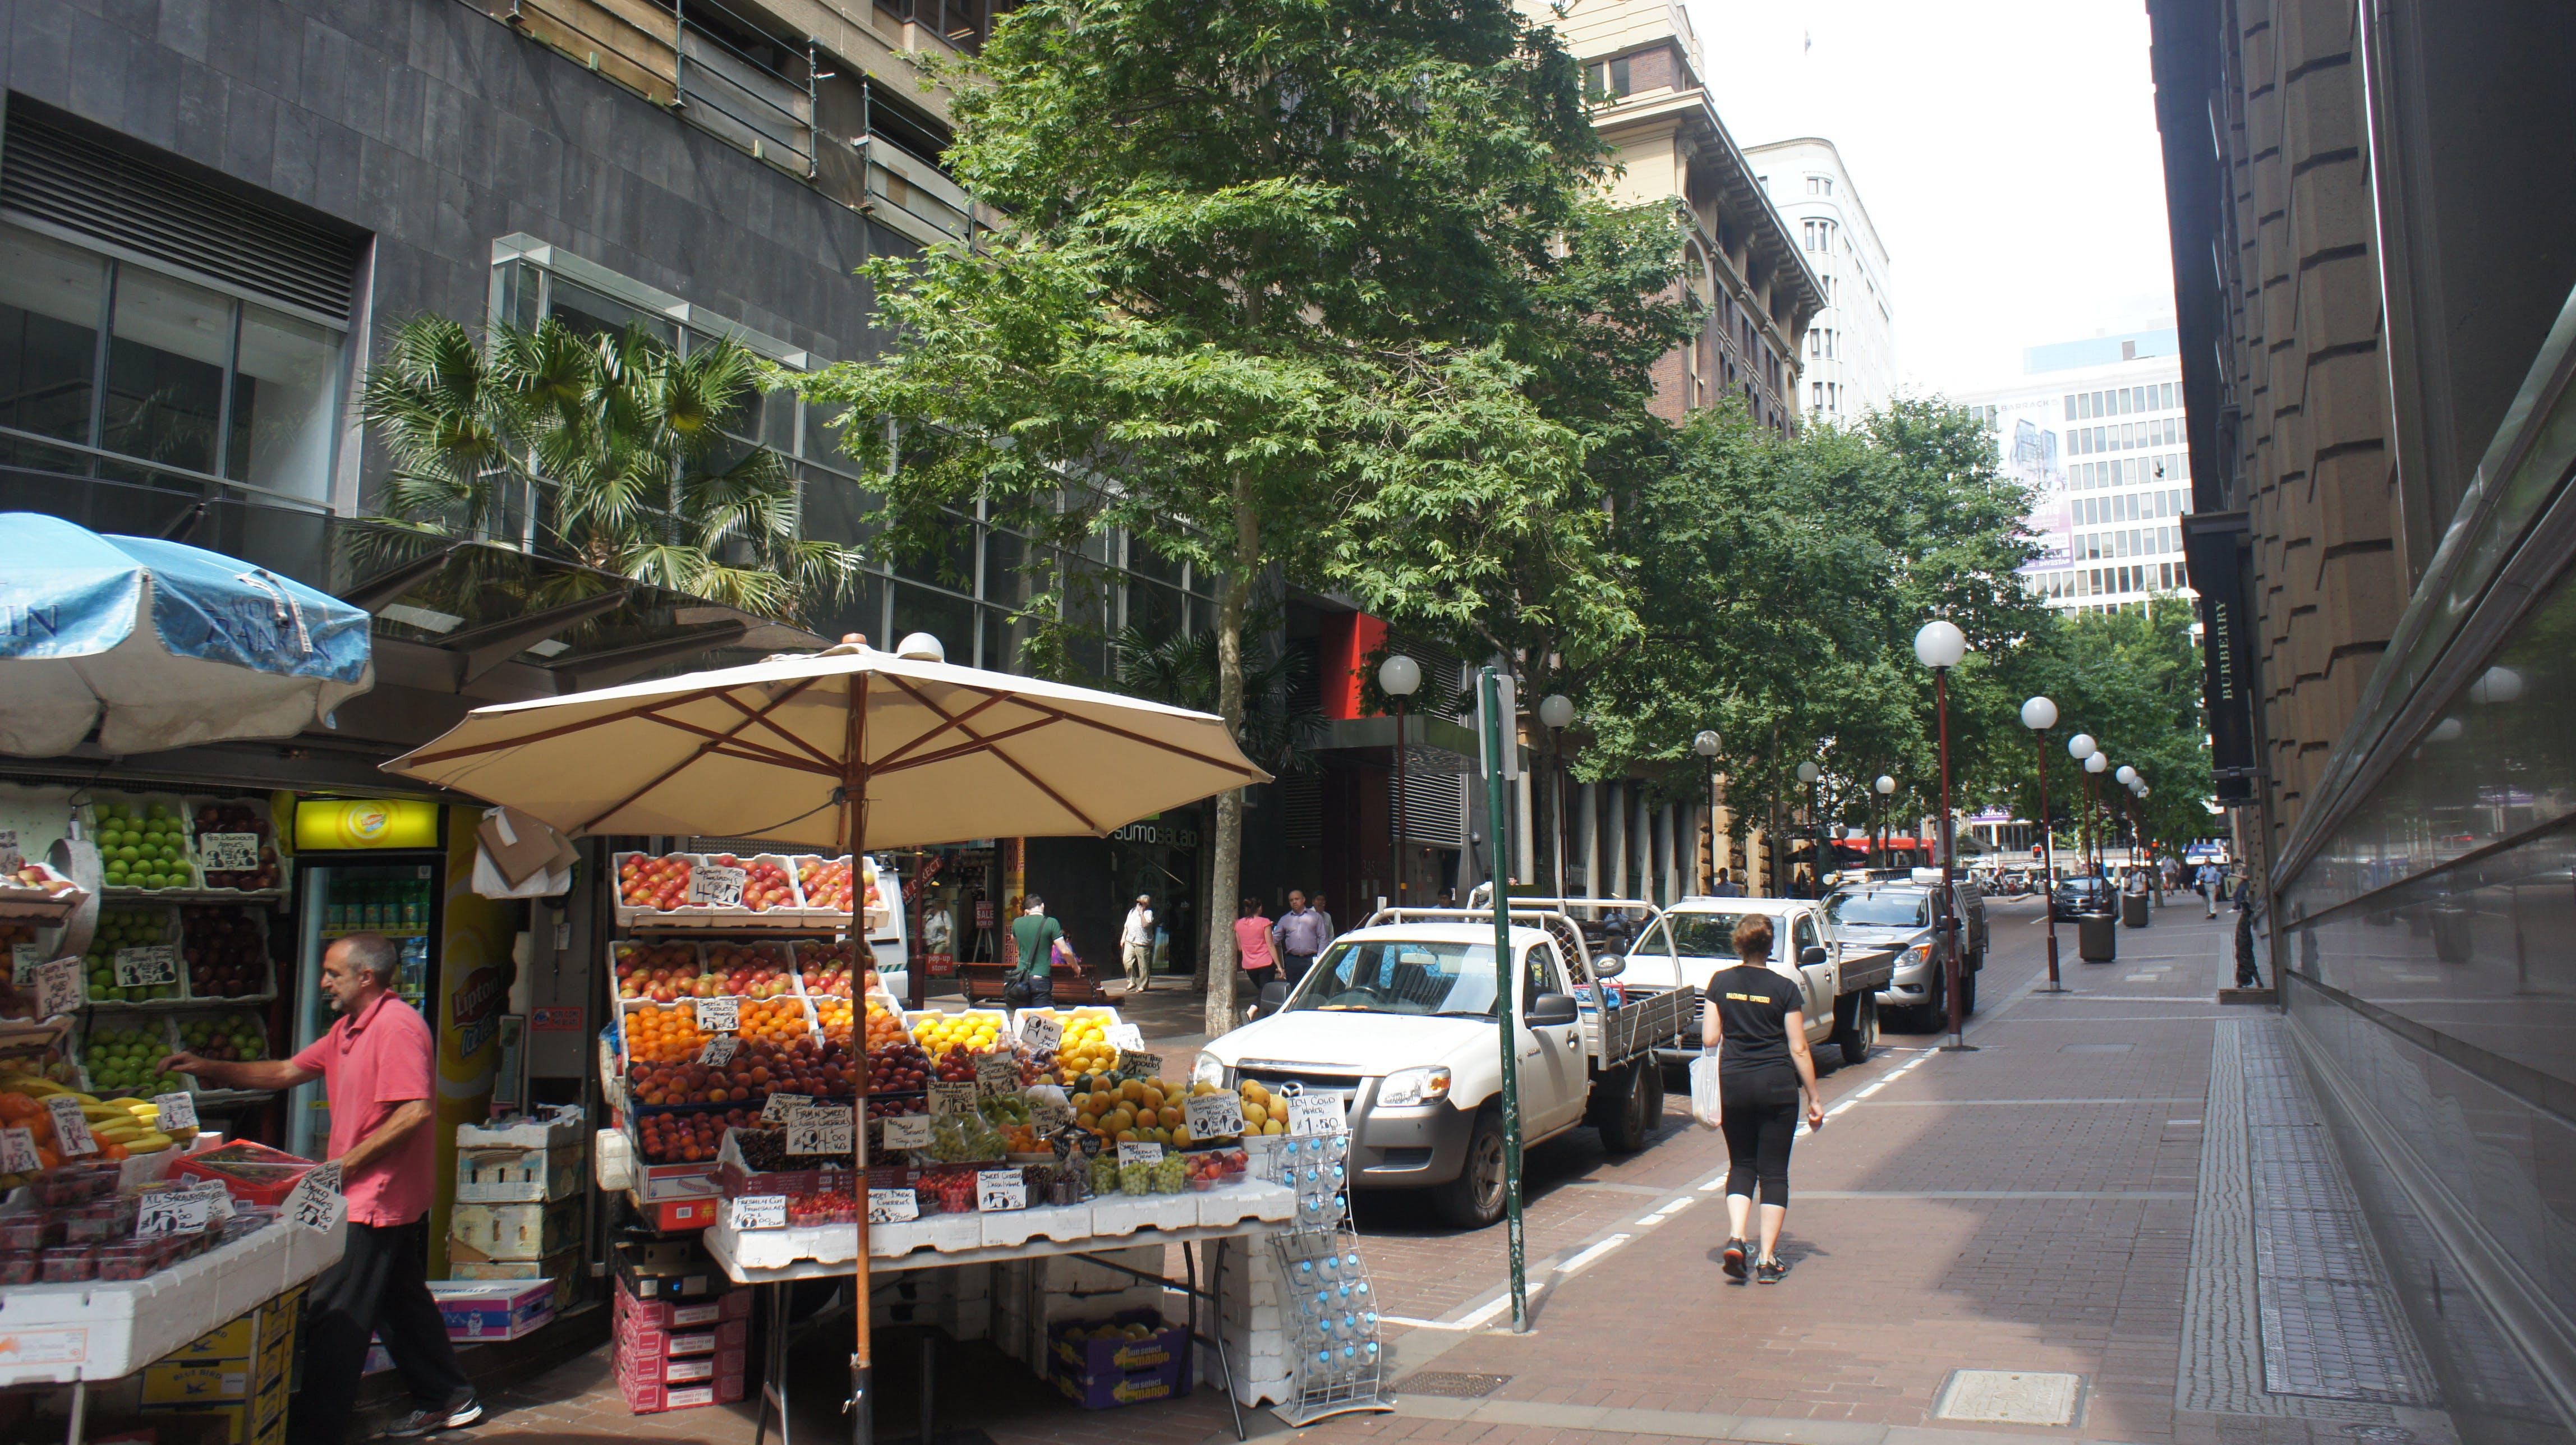 Barrack Street - existing